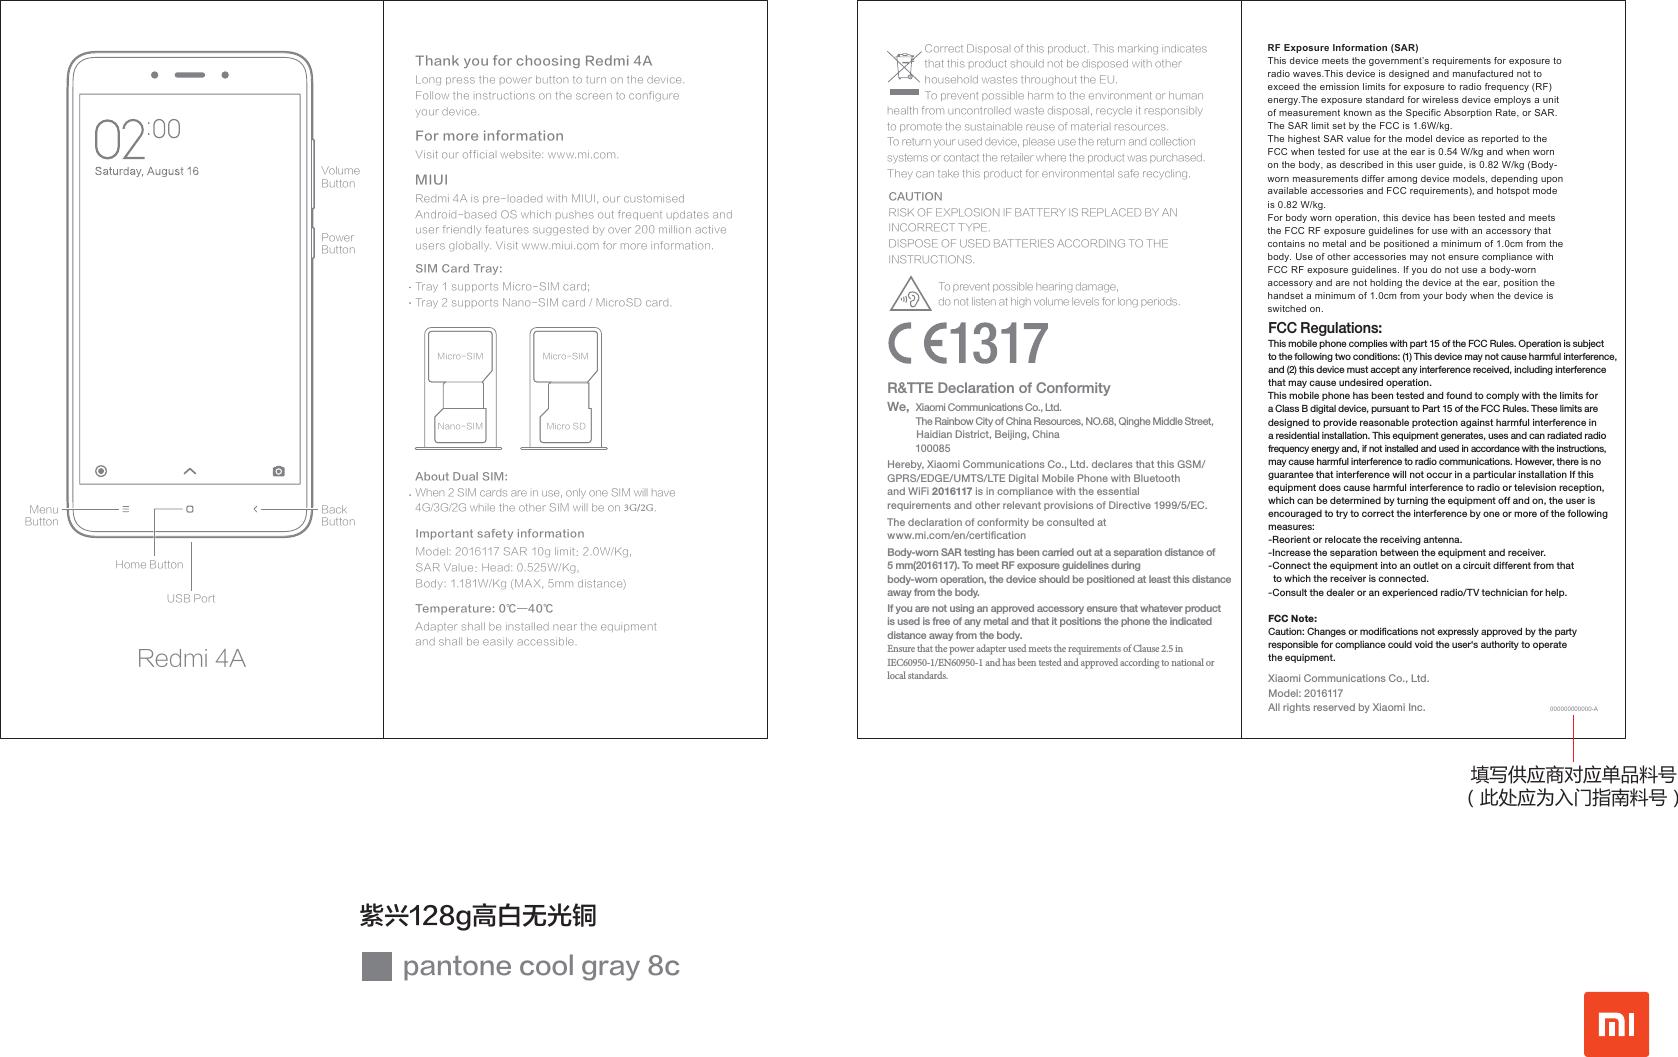 redmi 4a instruction manual